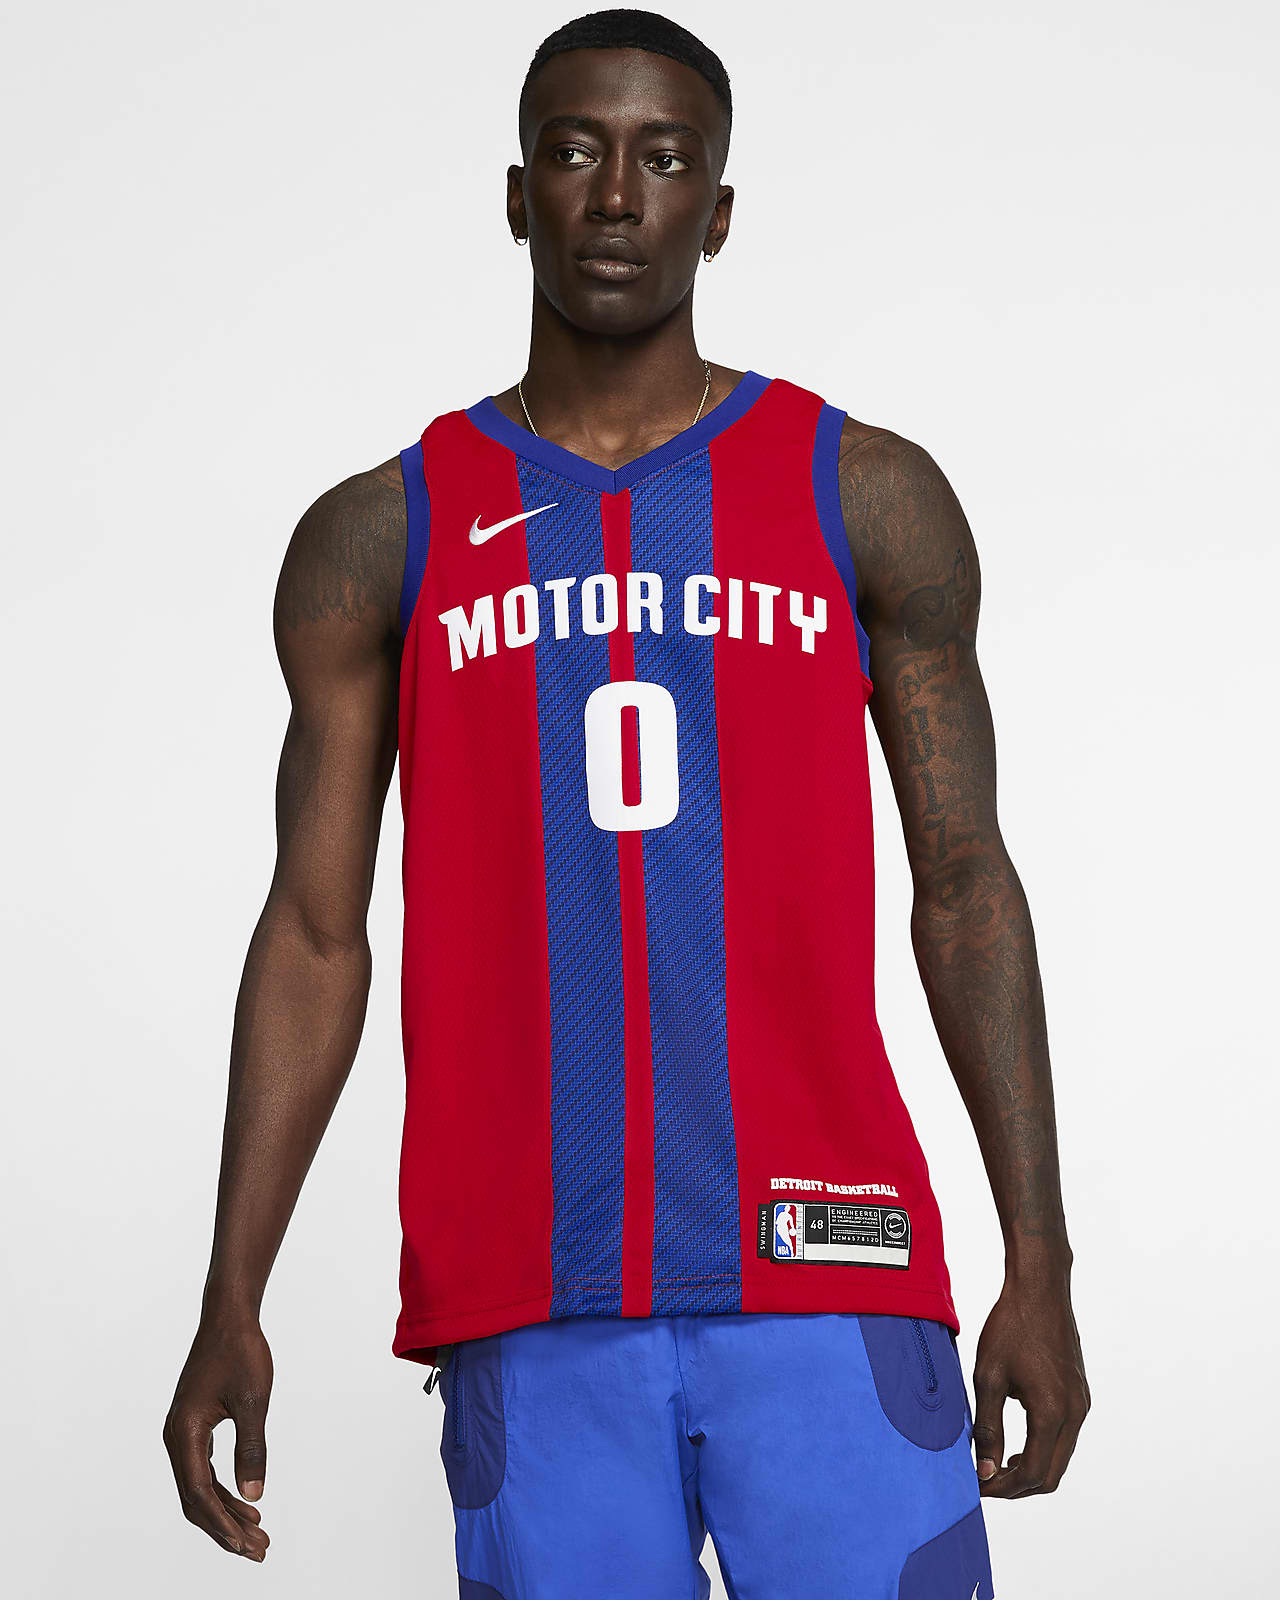 motor city jersey